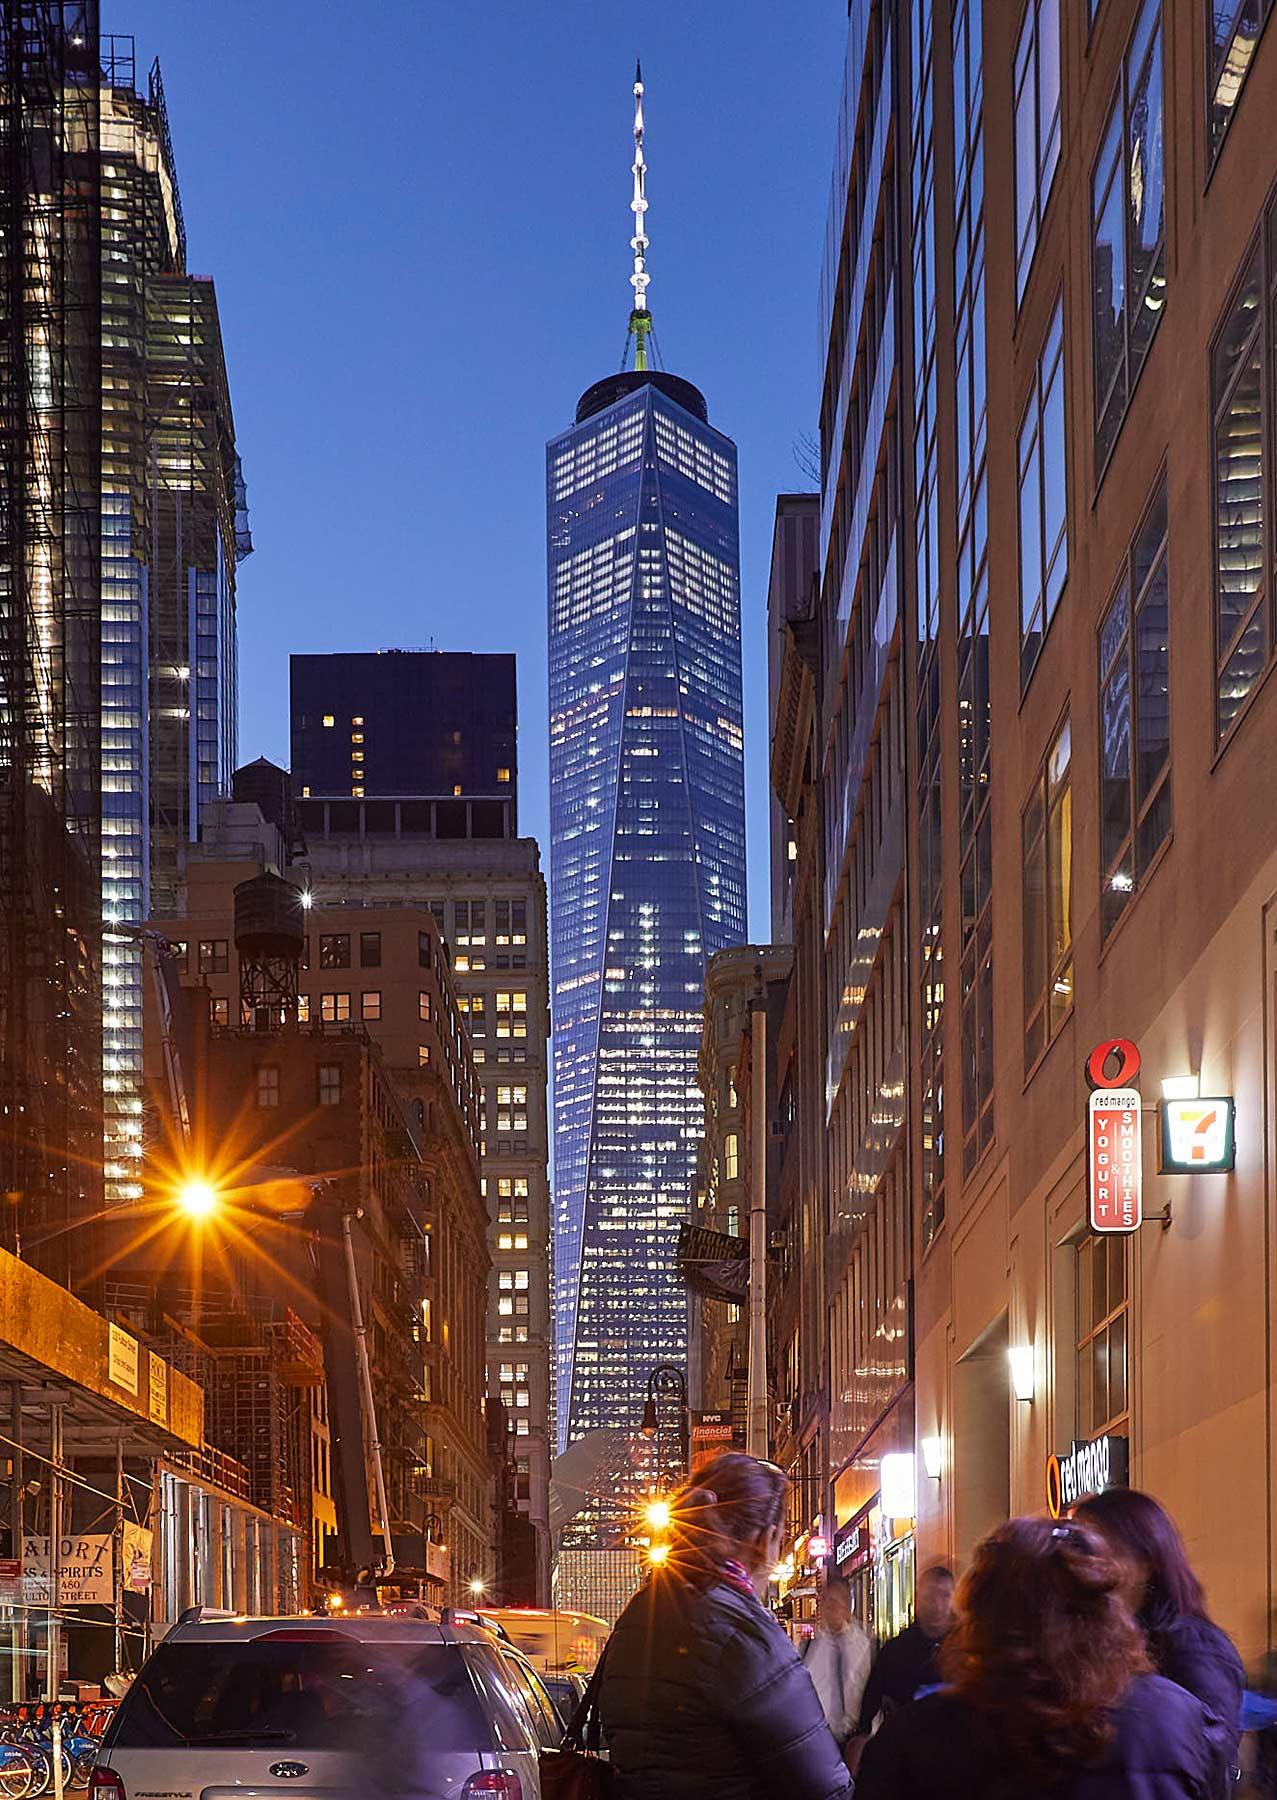 Jeremy-Frechette-OWTC-Lower-Manhattan.jpg